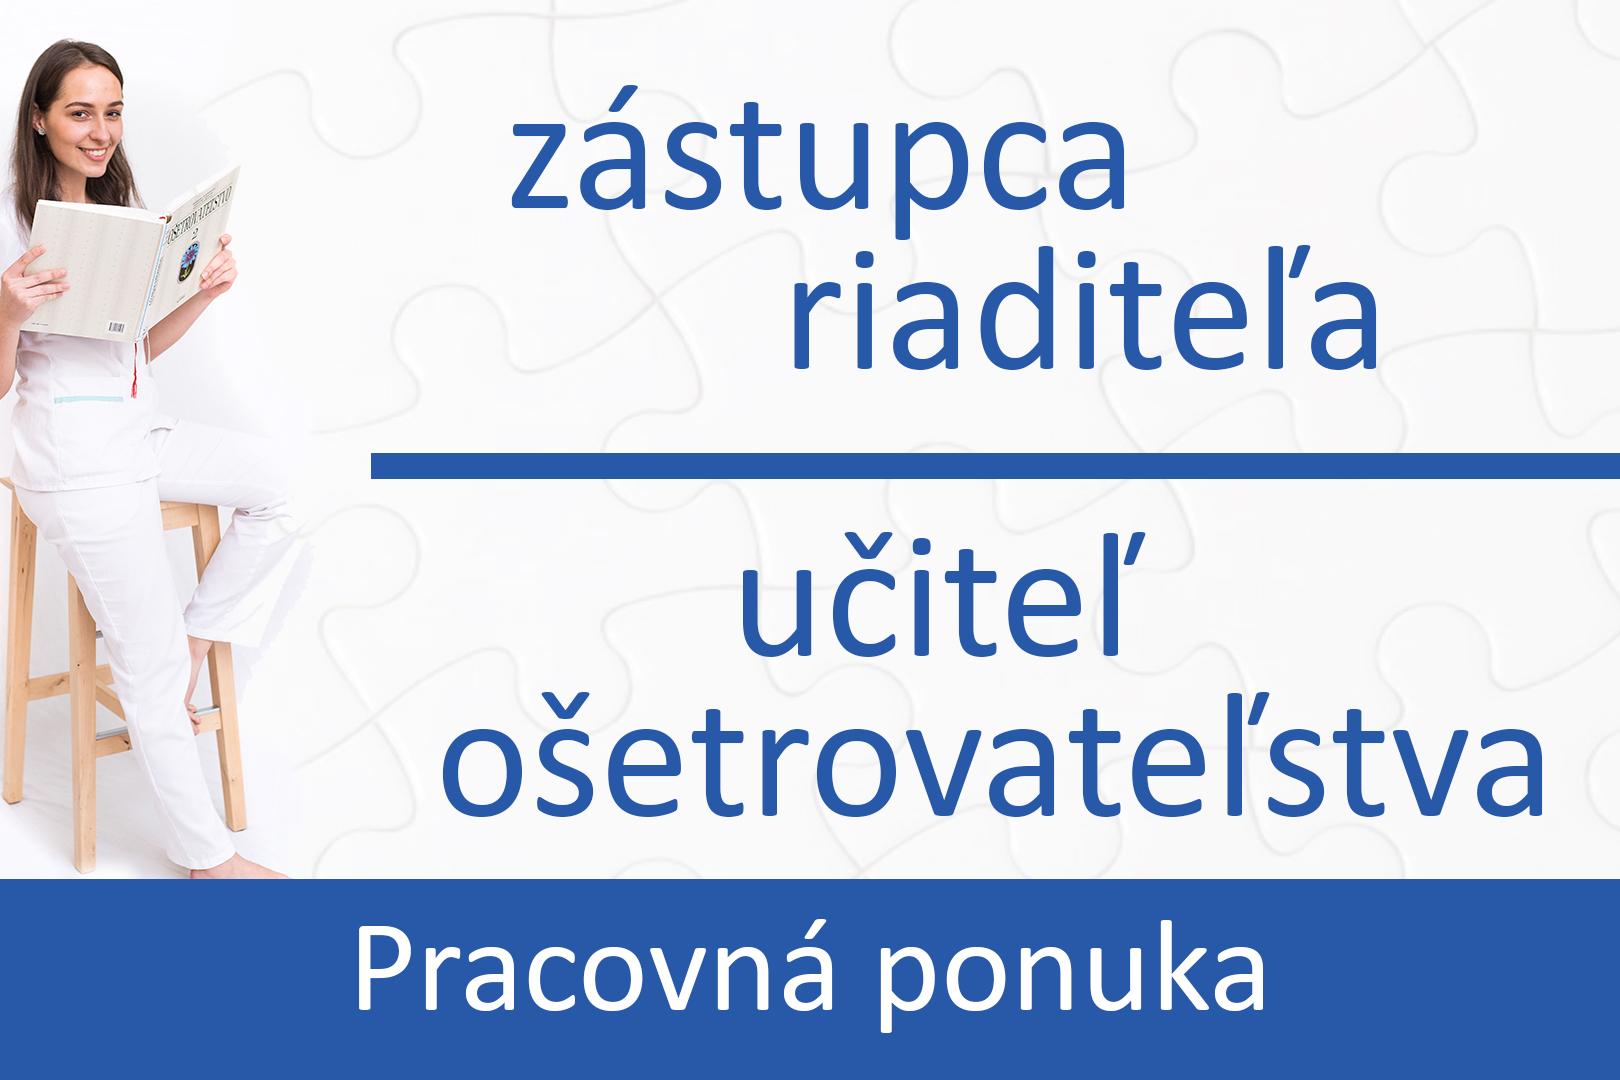 http://szslucnalc.sk/?page_id=77